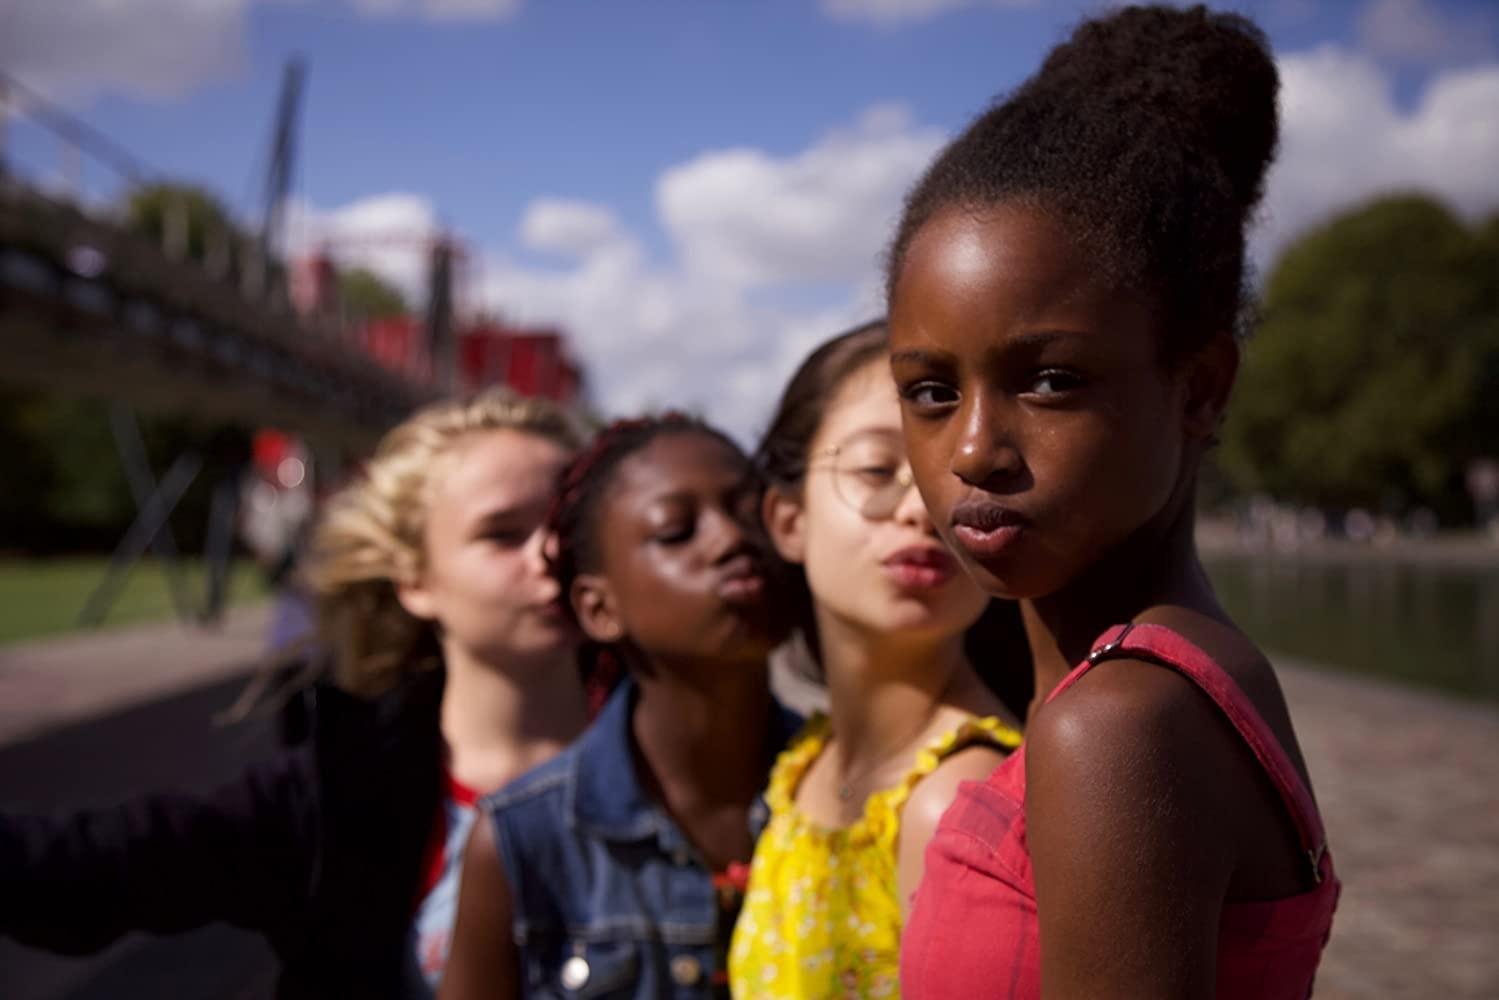 Cuties': Netflix pede desculpas por pôster acusado de sexualizar garotas de  11 anos